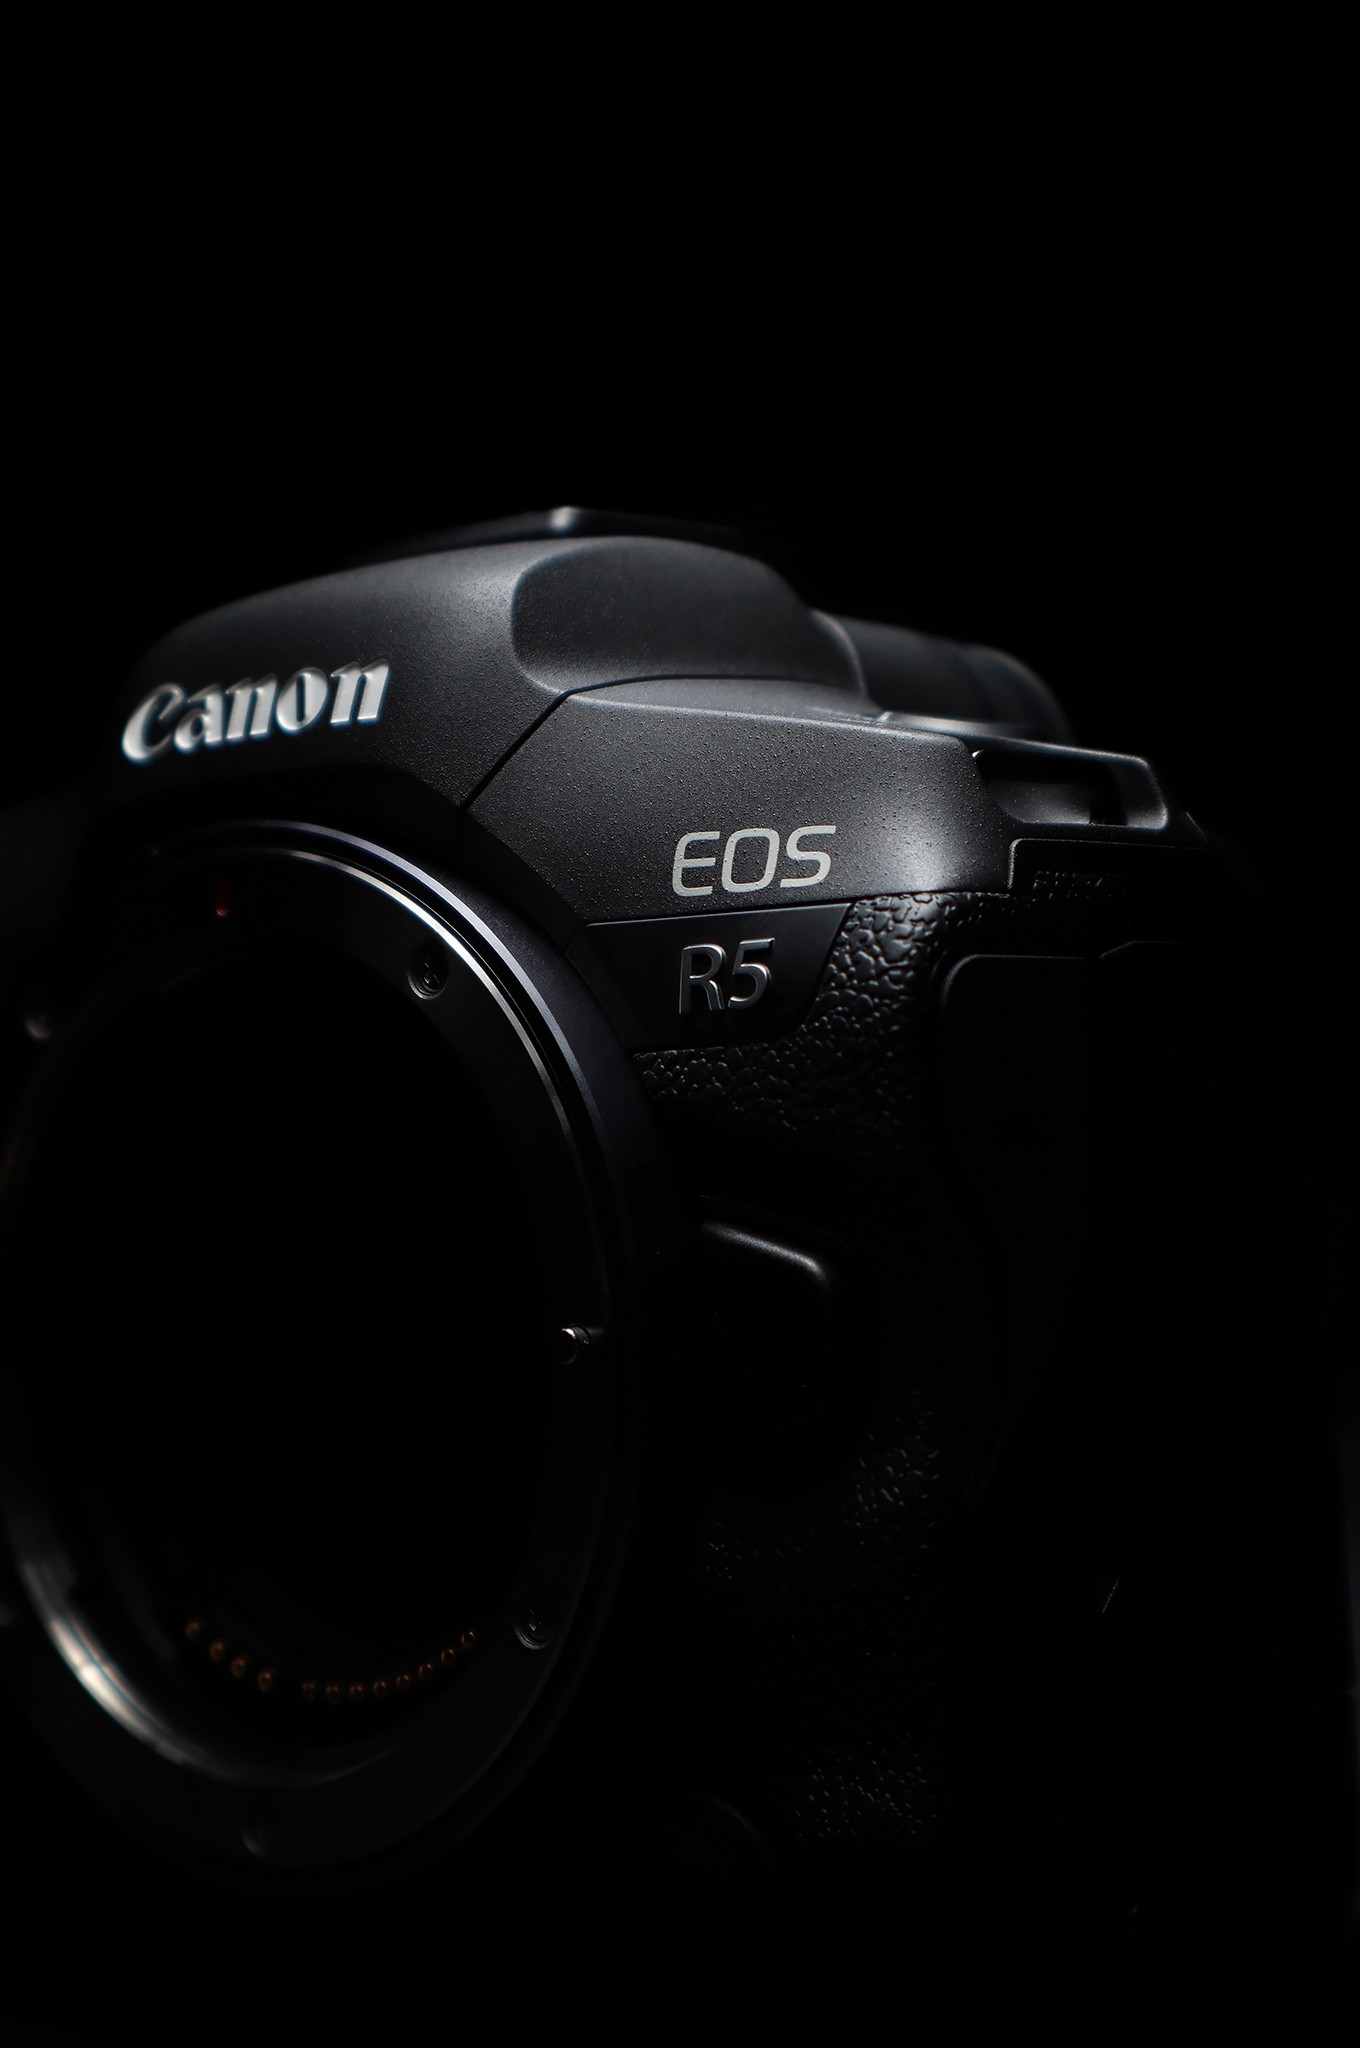 canon eos eosr5 canon nordic suomi valokuvaaja